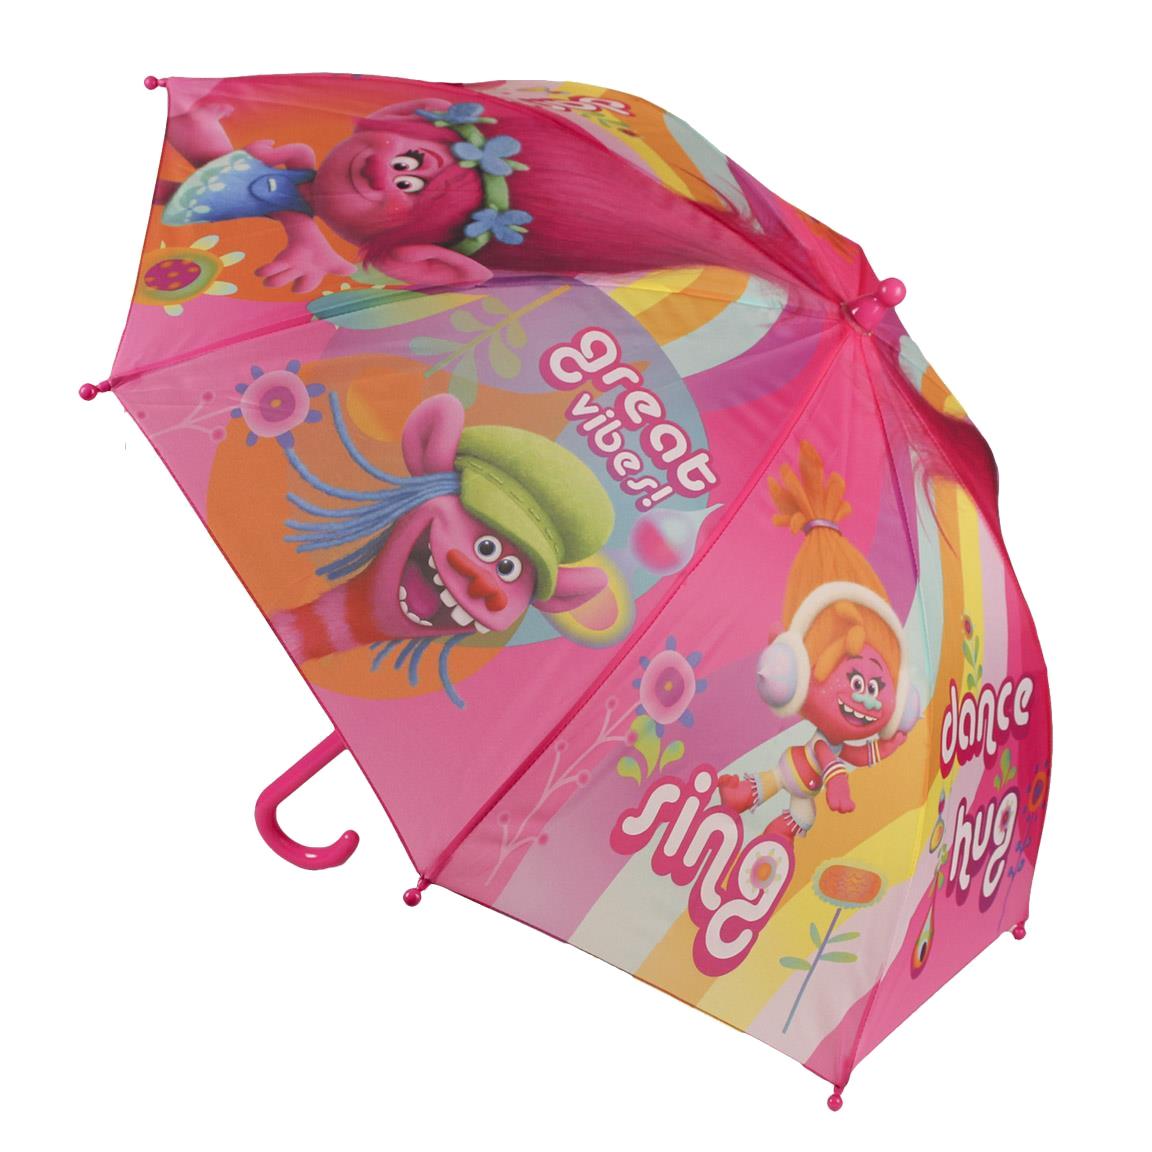 umbrela trolls, 42 cm, roz